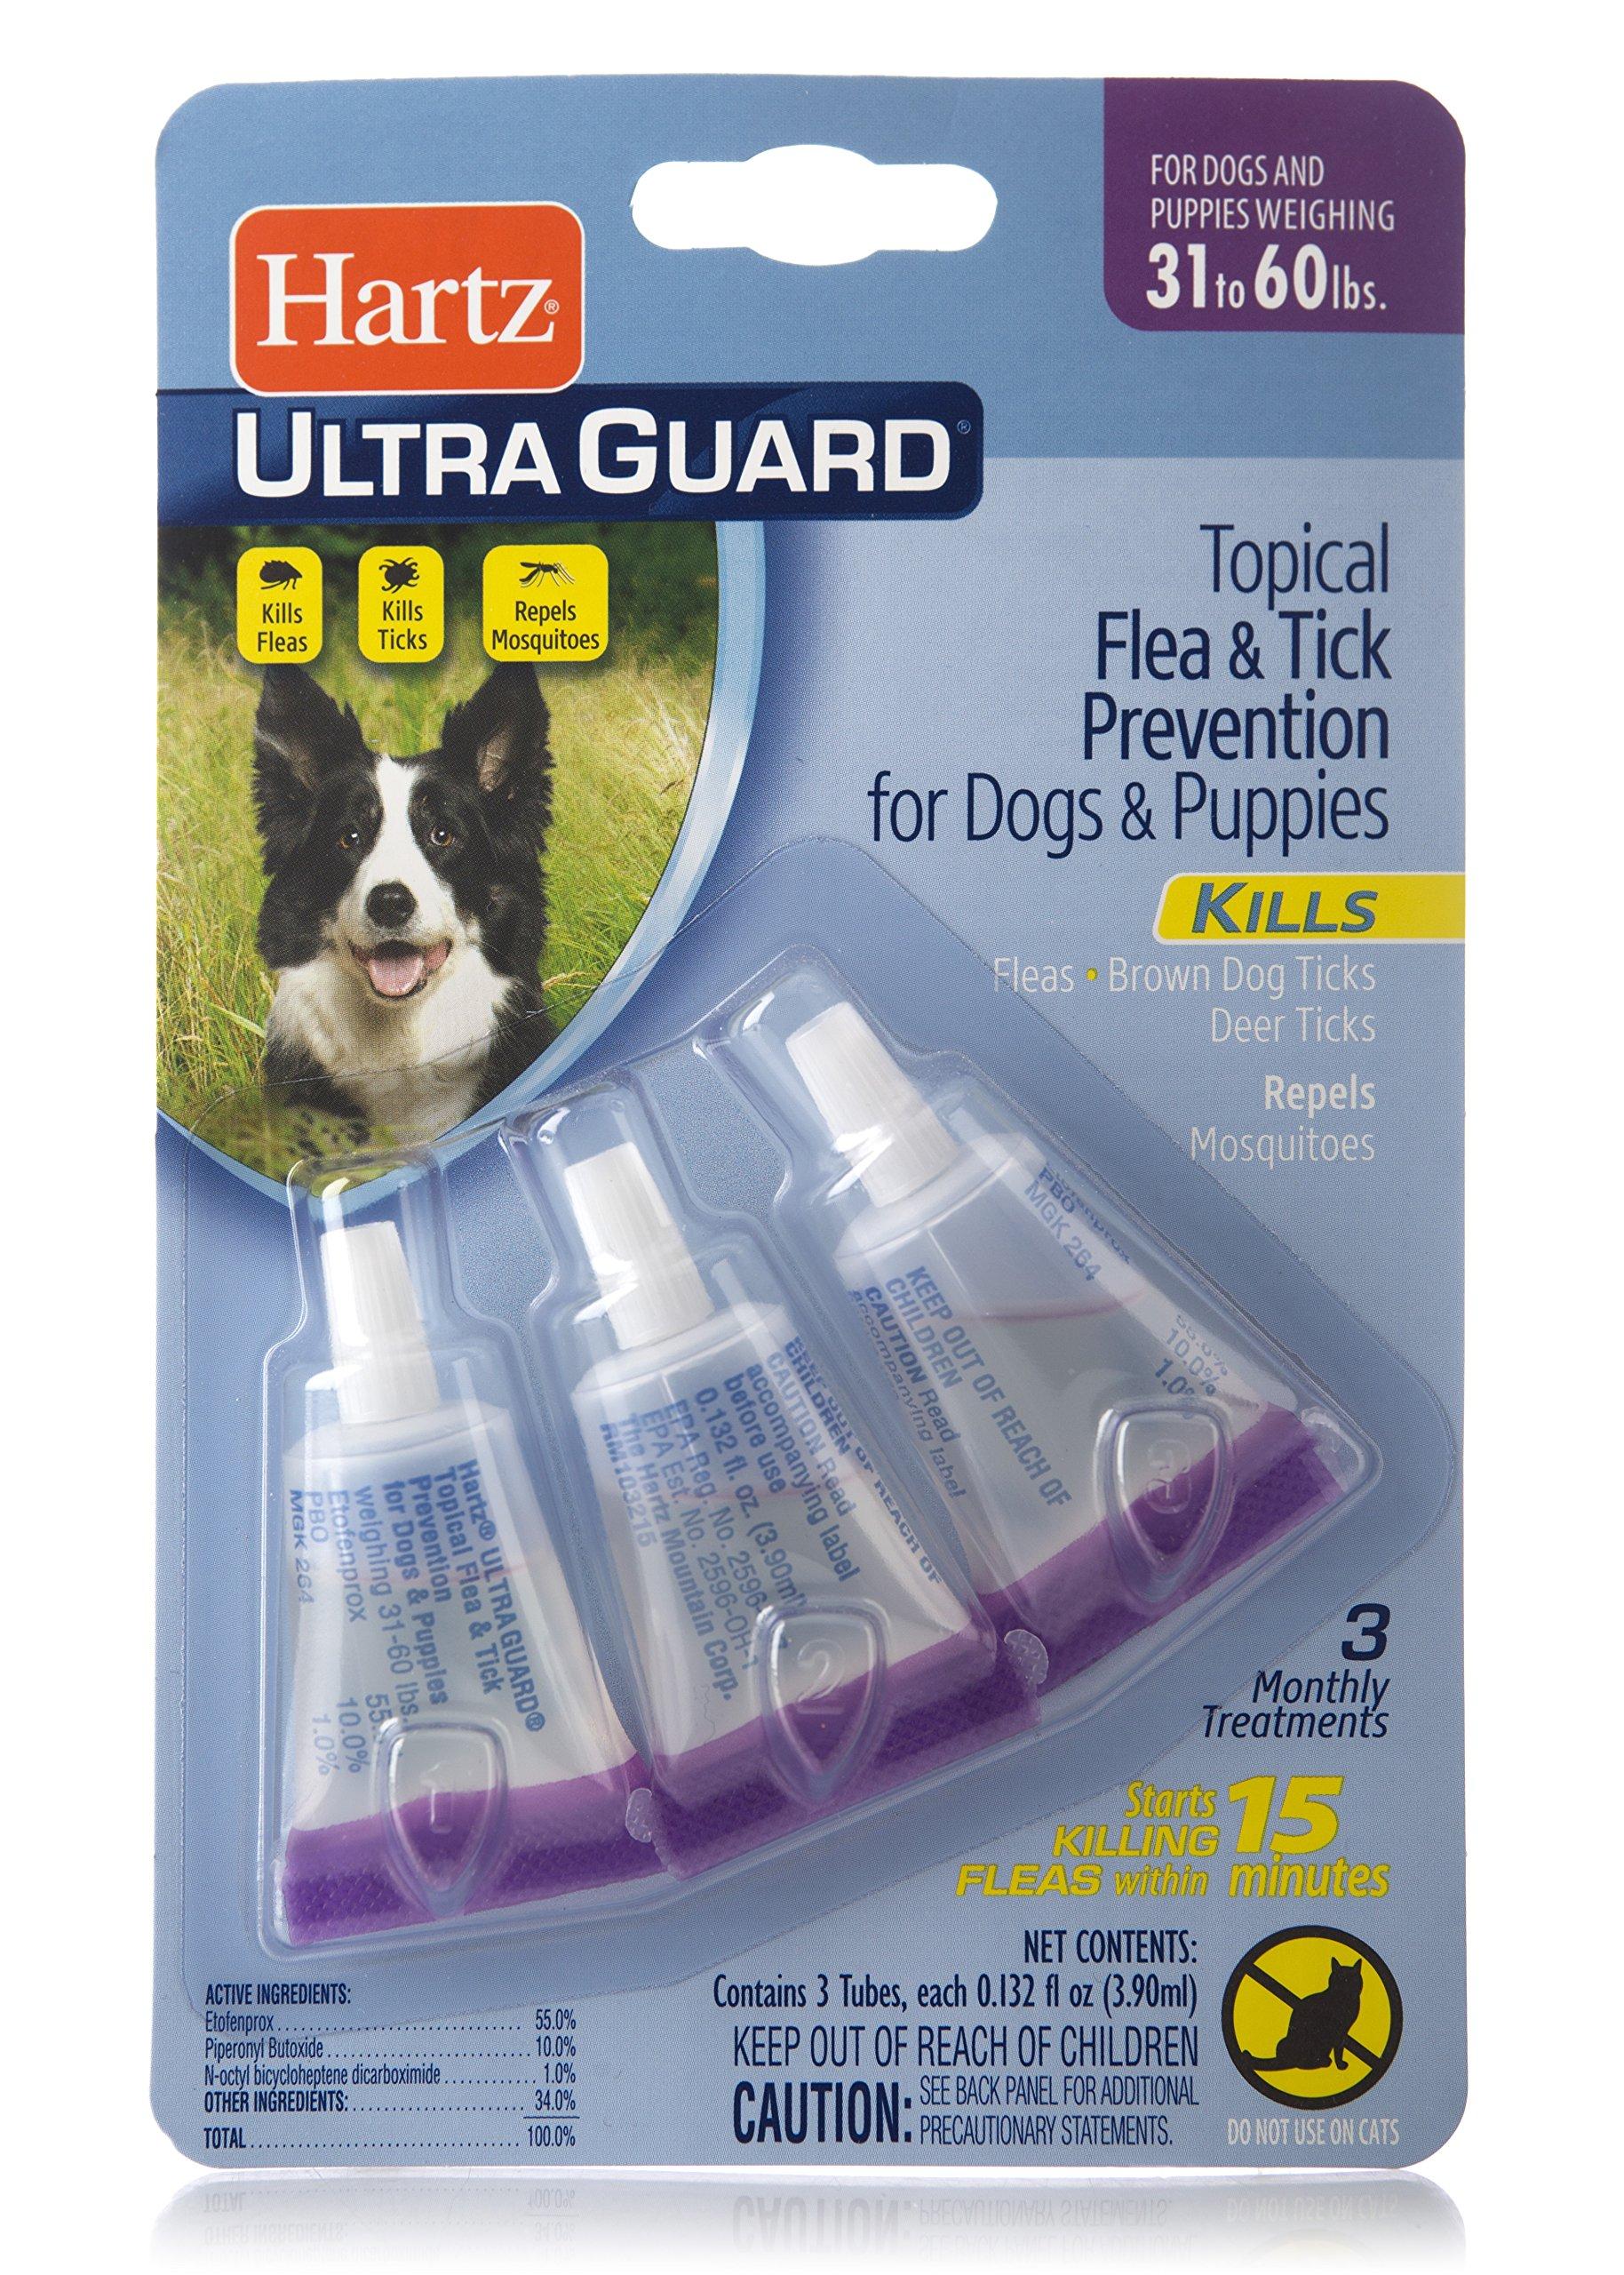 HARTZ UltraGuard Flea & Tick Drops for Dogs & Puppies 31-60lbs - 3 Monthly Treatment